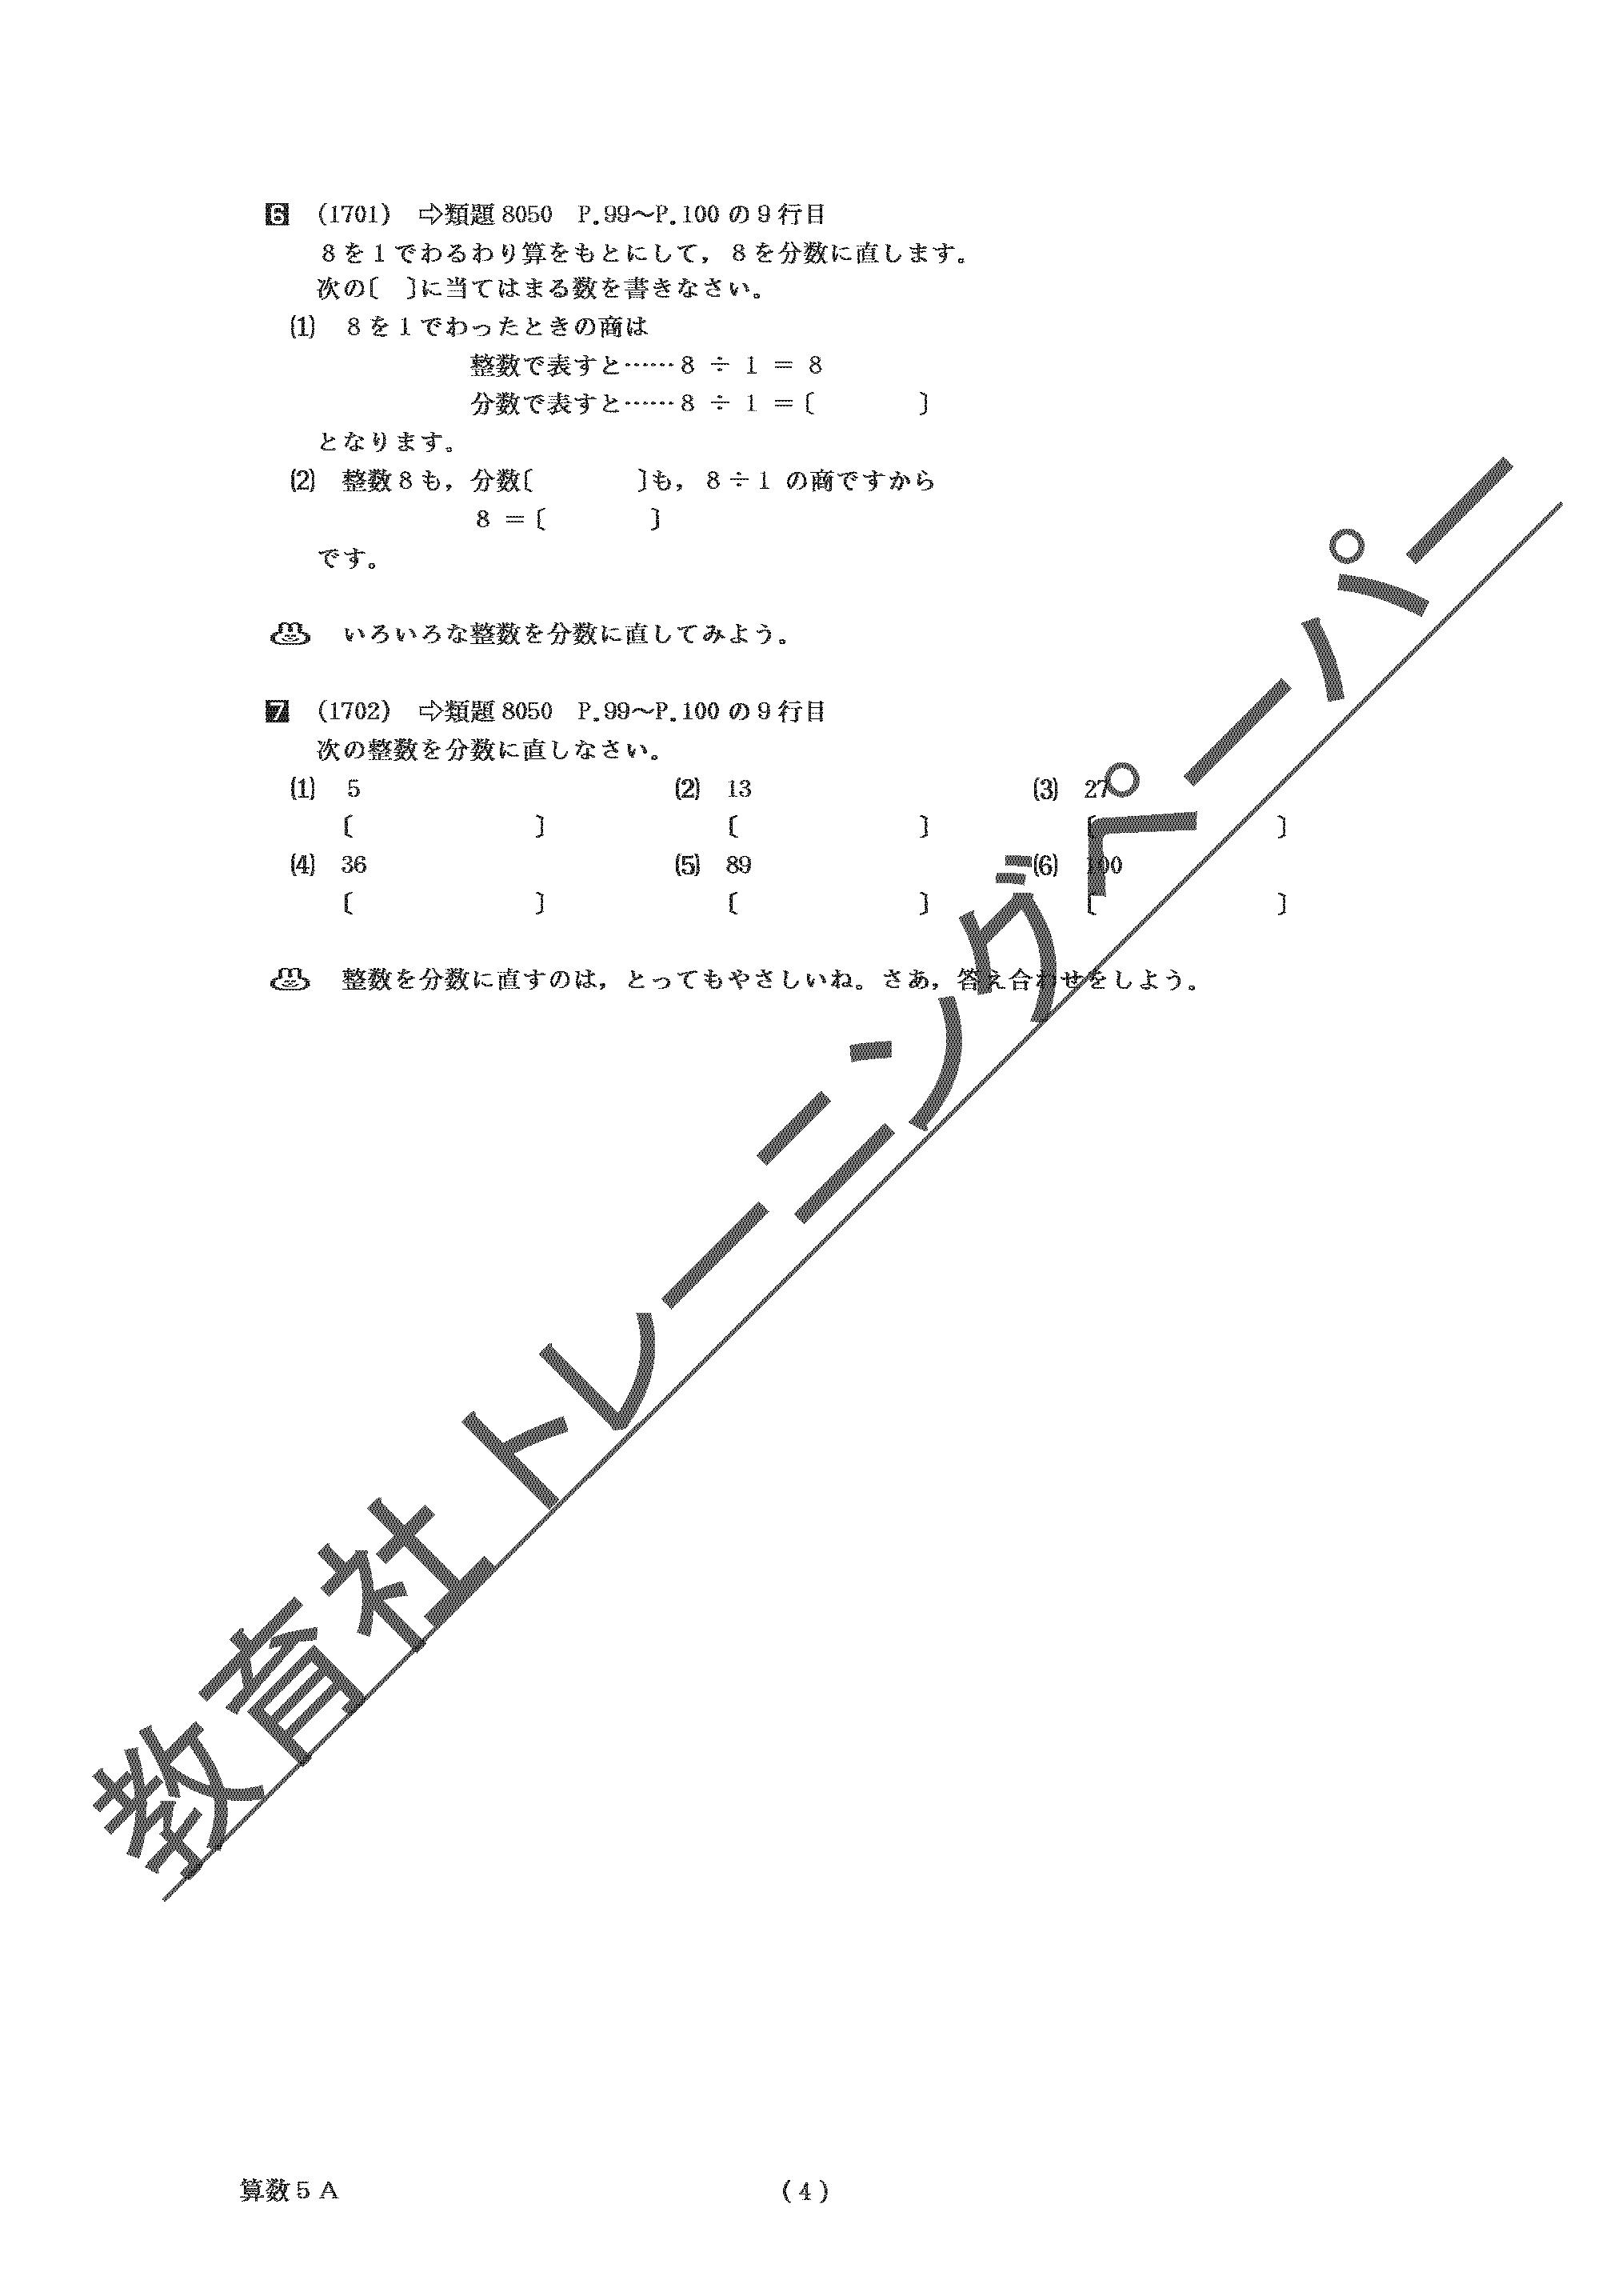 ITEM-S5SANSU-010